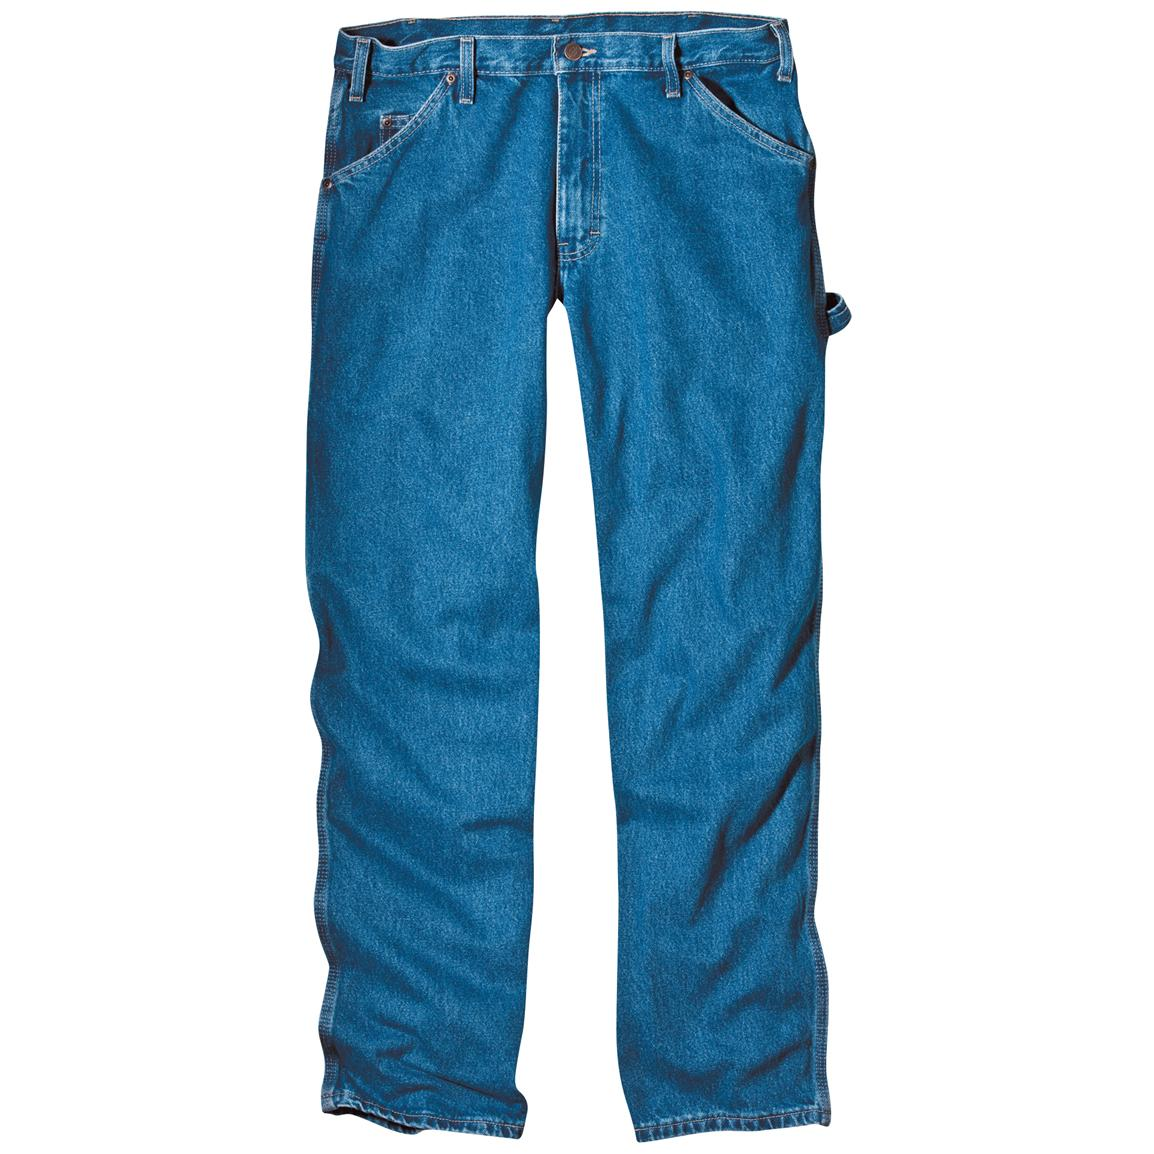 Clothing Clip Art. Jeans Clipart-Clothing Clip art. jeans clipart-8